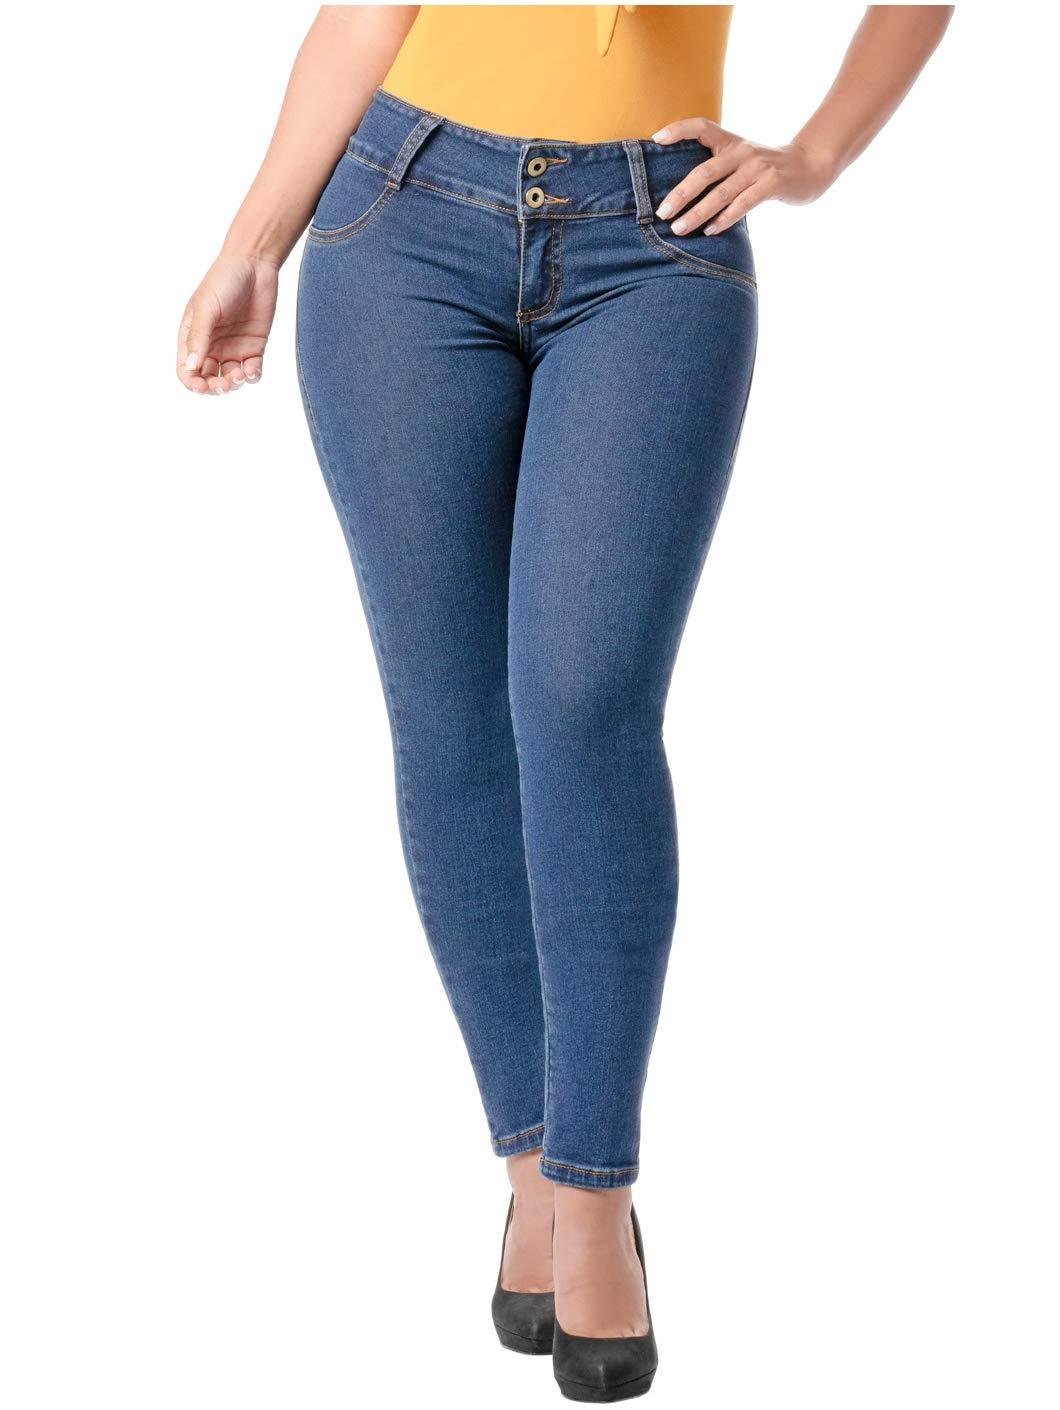 Lowla Colombian Skinny Jeans For Women Butt Lift Pantalones De Mujer Colombianos Buy Online In Grenada At Grenada Desertcart Com Productid 31073758